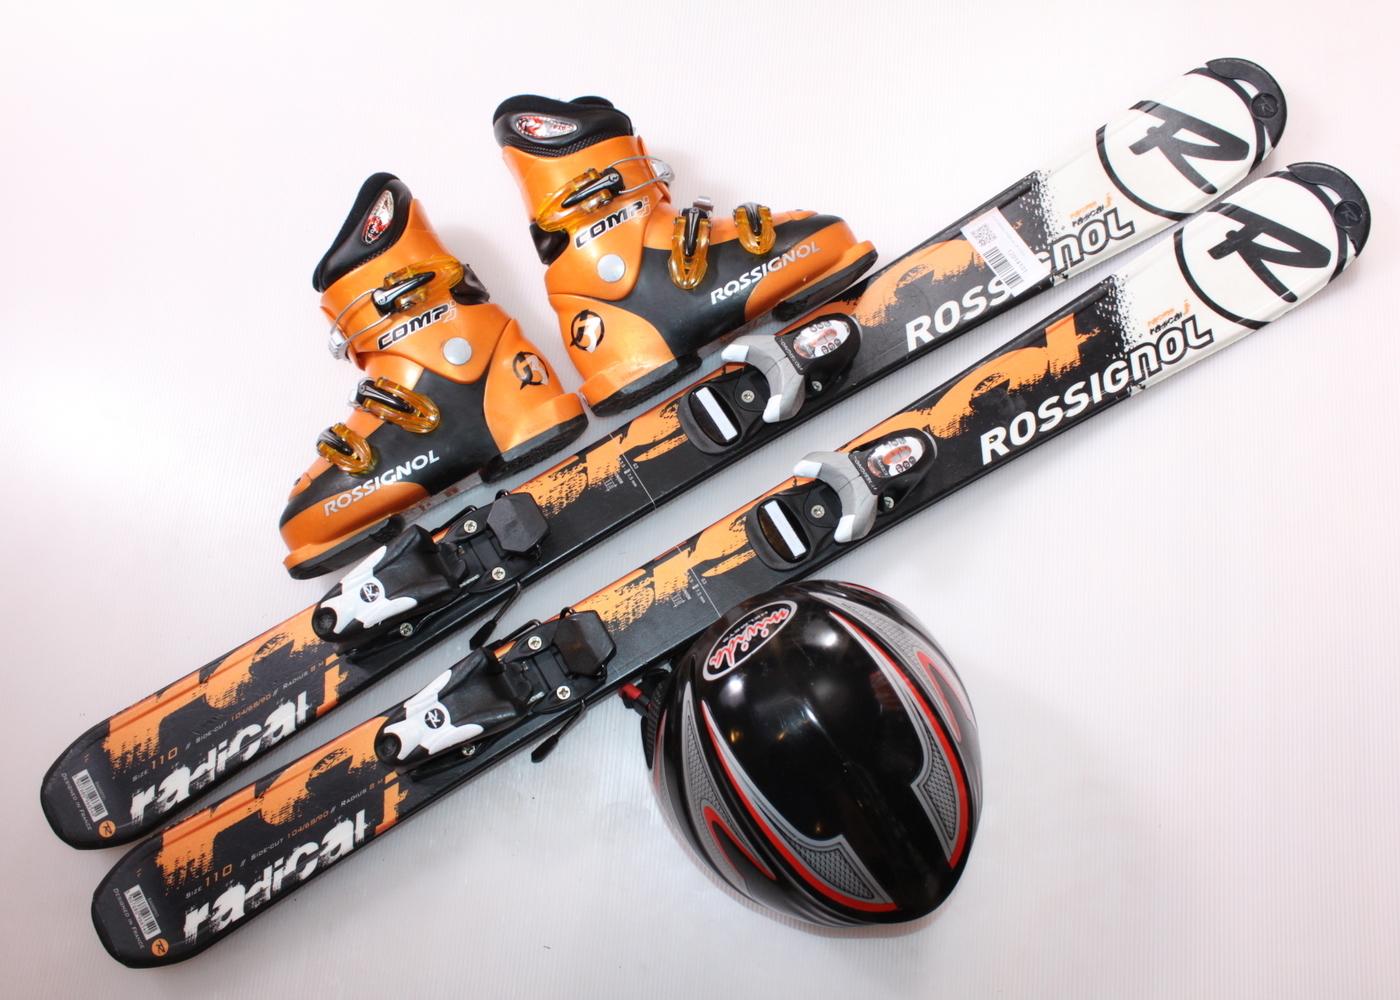 Dětské lyže ROSSIGNOL RADICAL JR 110 cm + lyžáky  32EU + helma